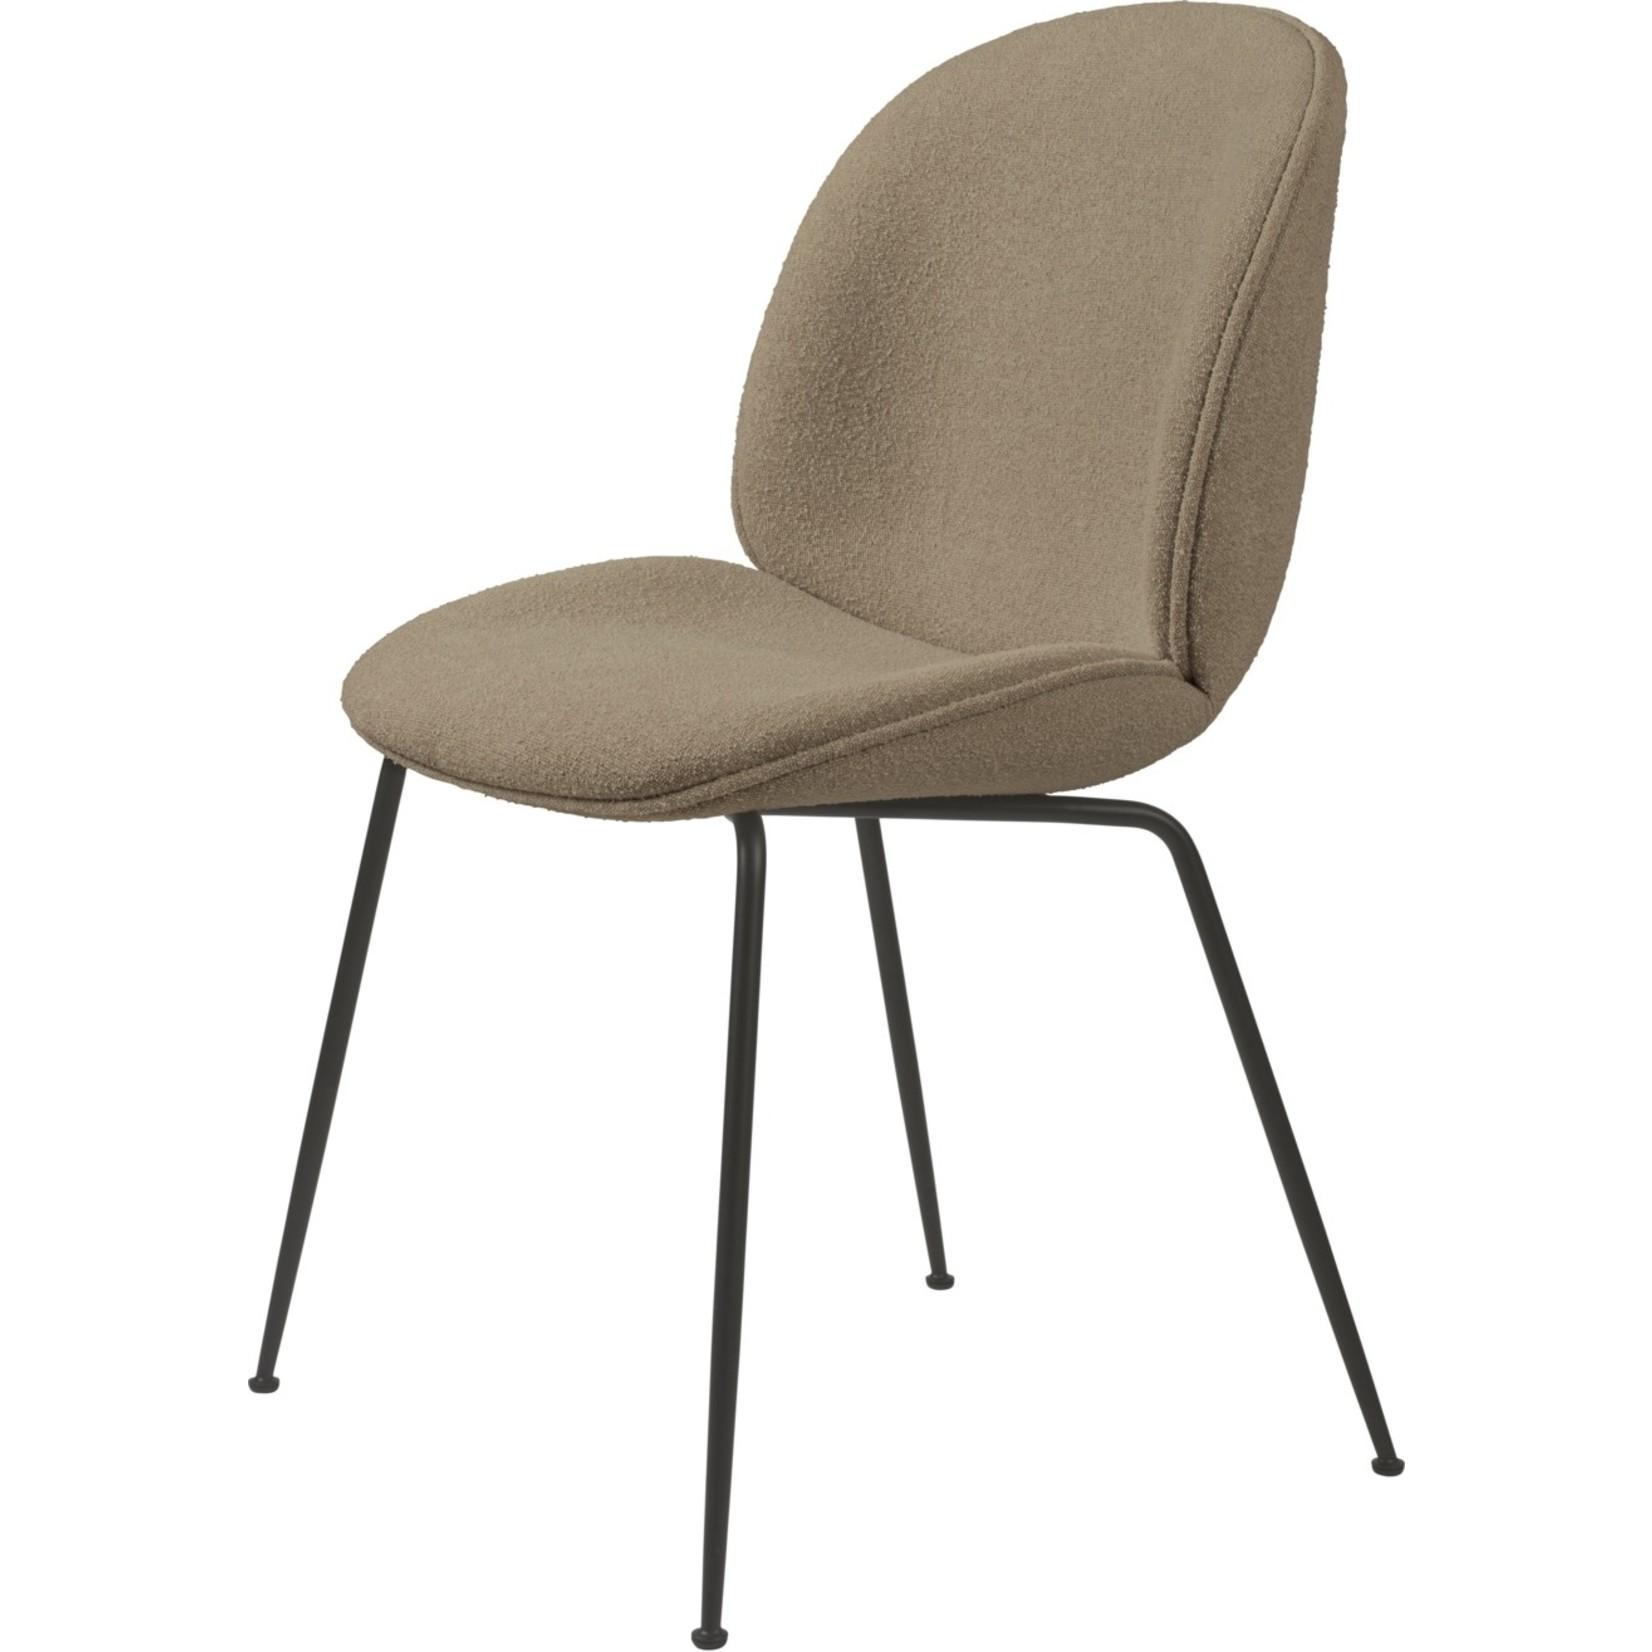 Gubi Chaise de salle à manger Beetle | Light Boucle 003 & Base Noir Mat